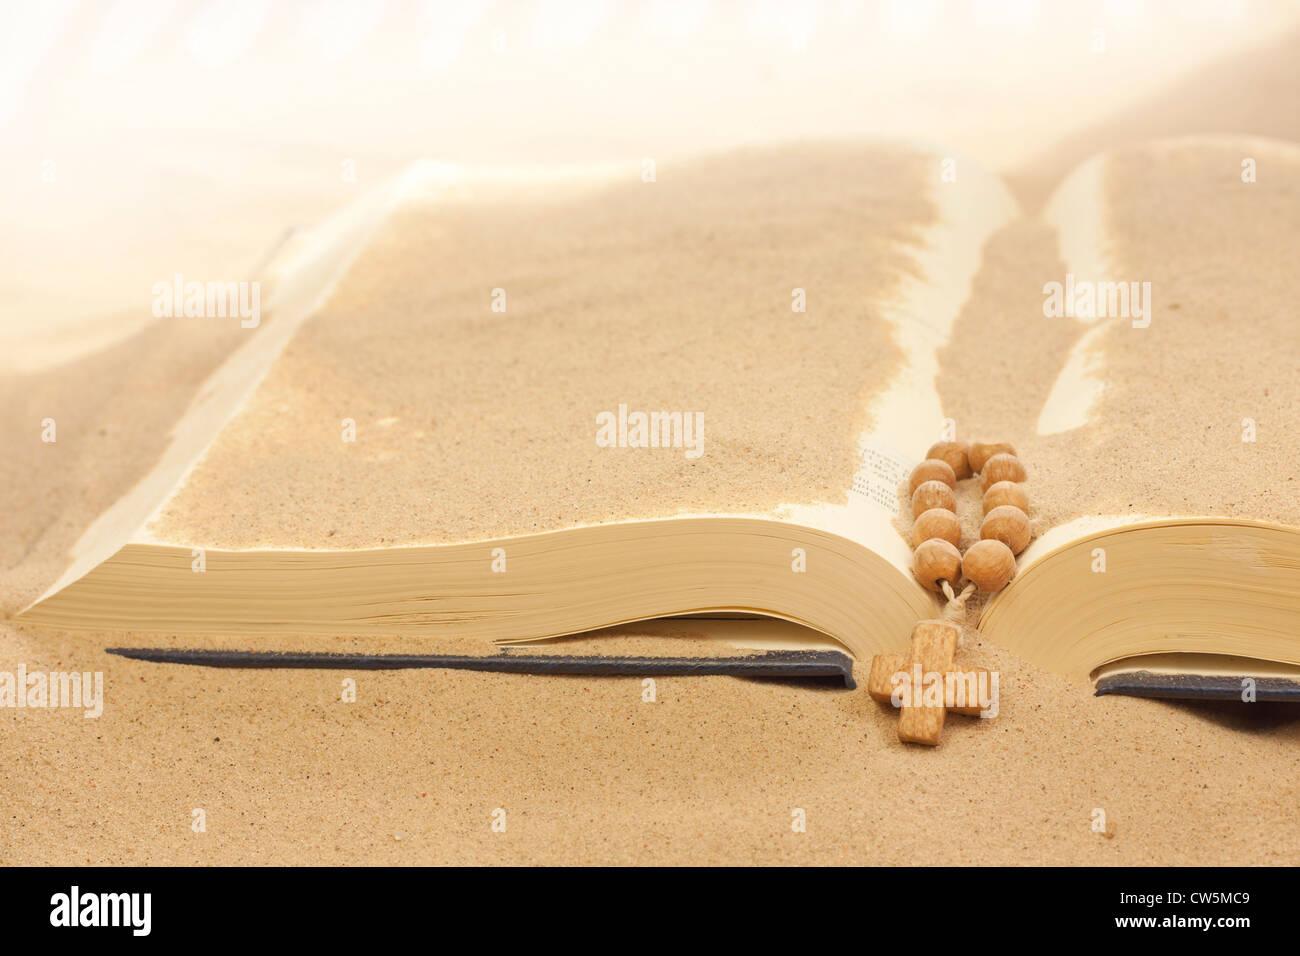 Loss of faith forgotten words of Bible religion concept on desert in sand - Stock Image